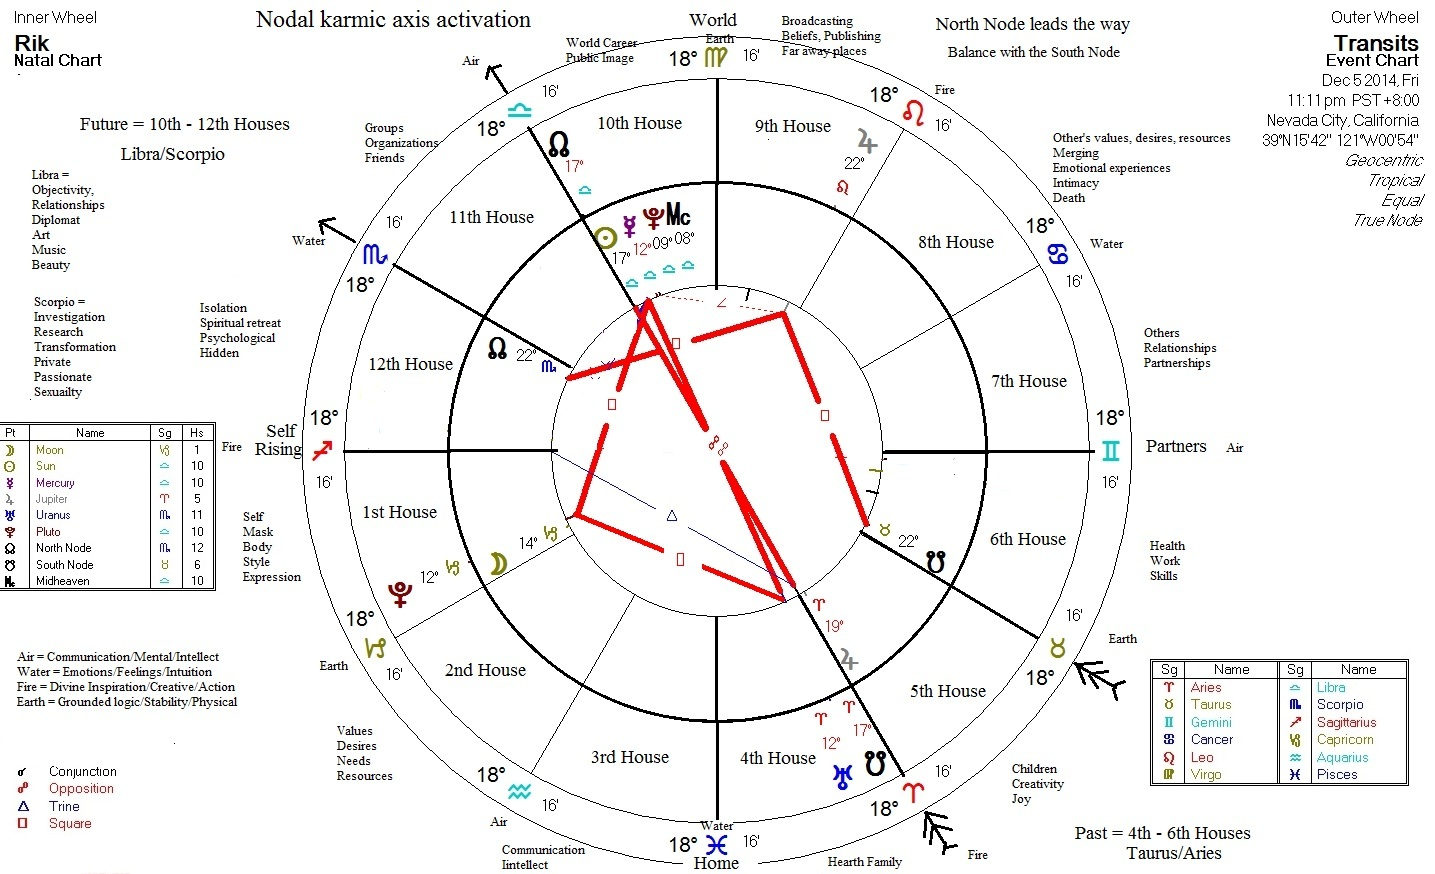 Astrology: Karmic North and South Nodes (Rahu and Ketu)